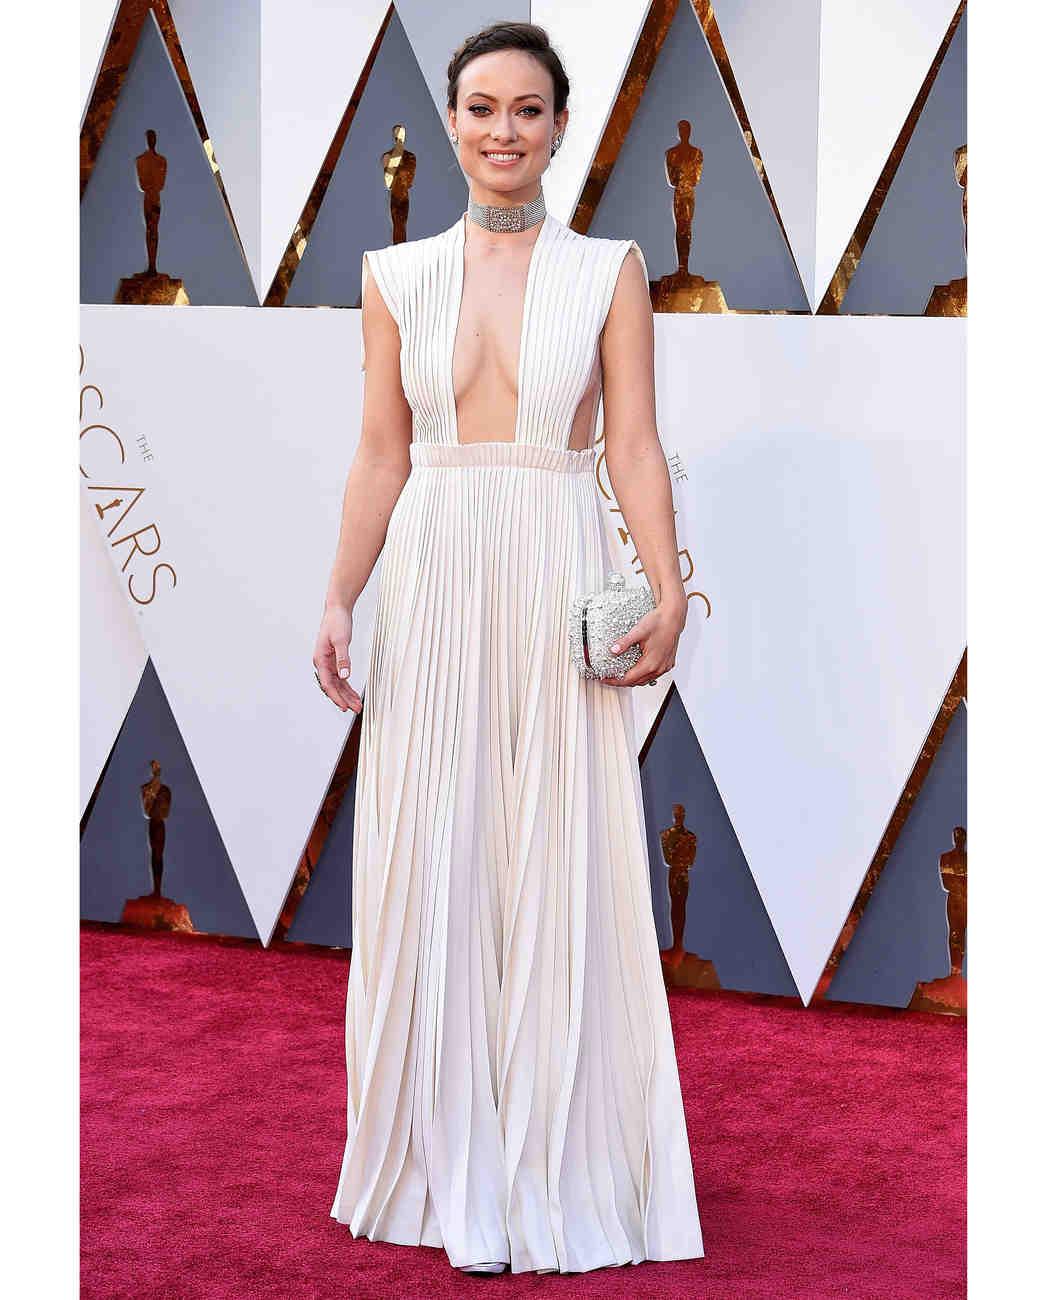 2016-oscars-dresses-olivia-wilde-0216.jpg